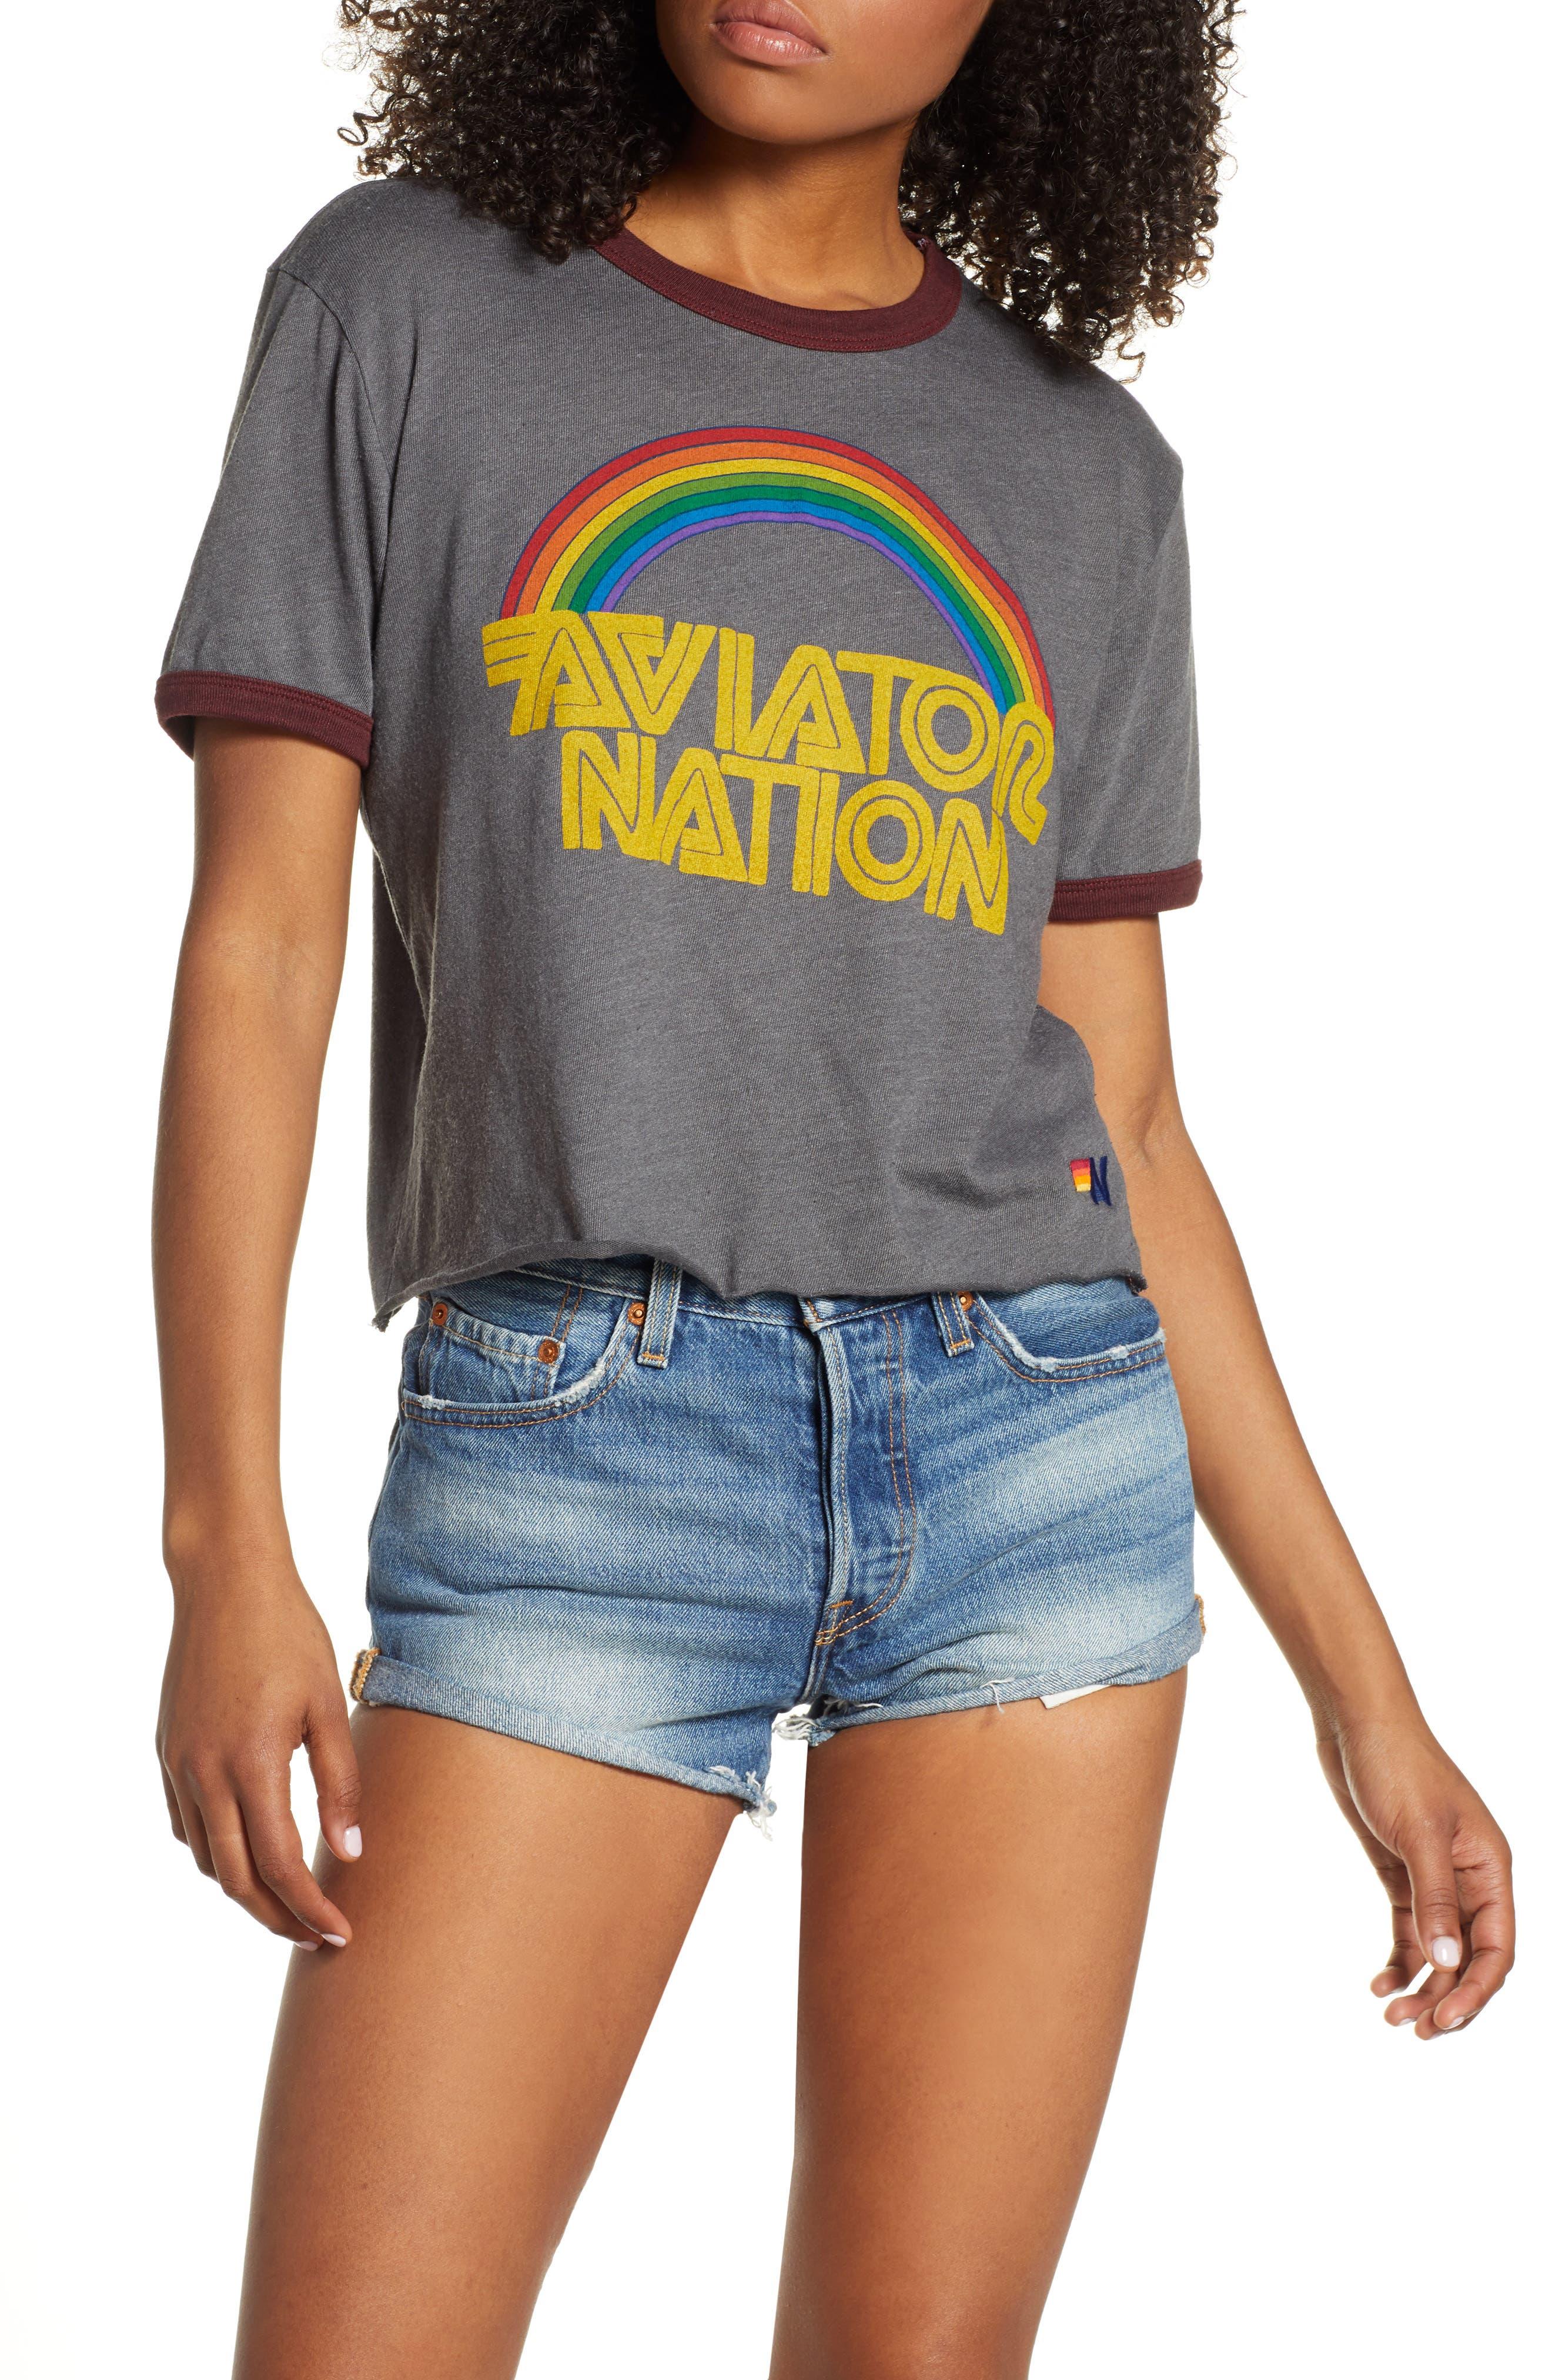 Women's 70s Shirts, Blouses, Hippie Tops Womens Aviator Nation 70S Boyfriend Ringer Tee $83.00 AT vintagedancer.com